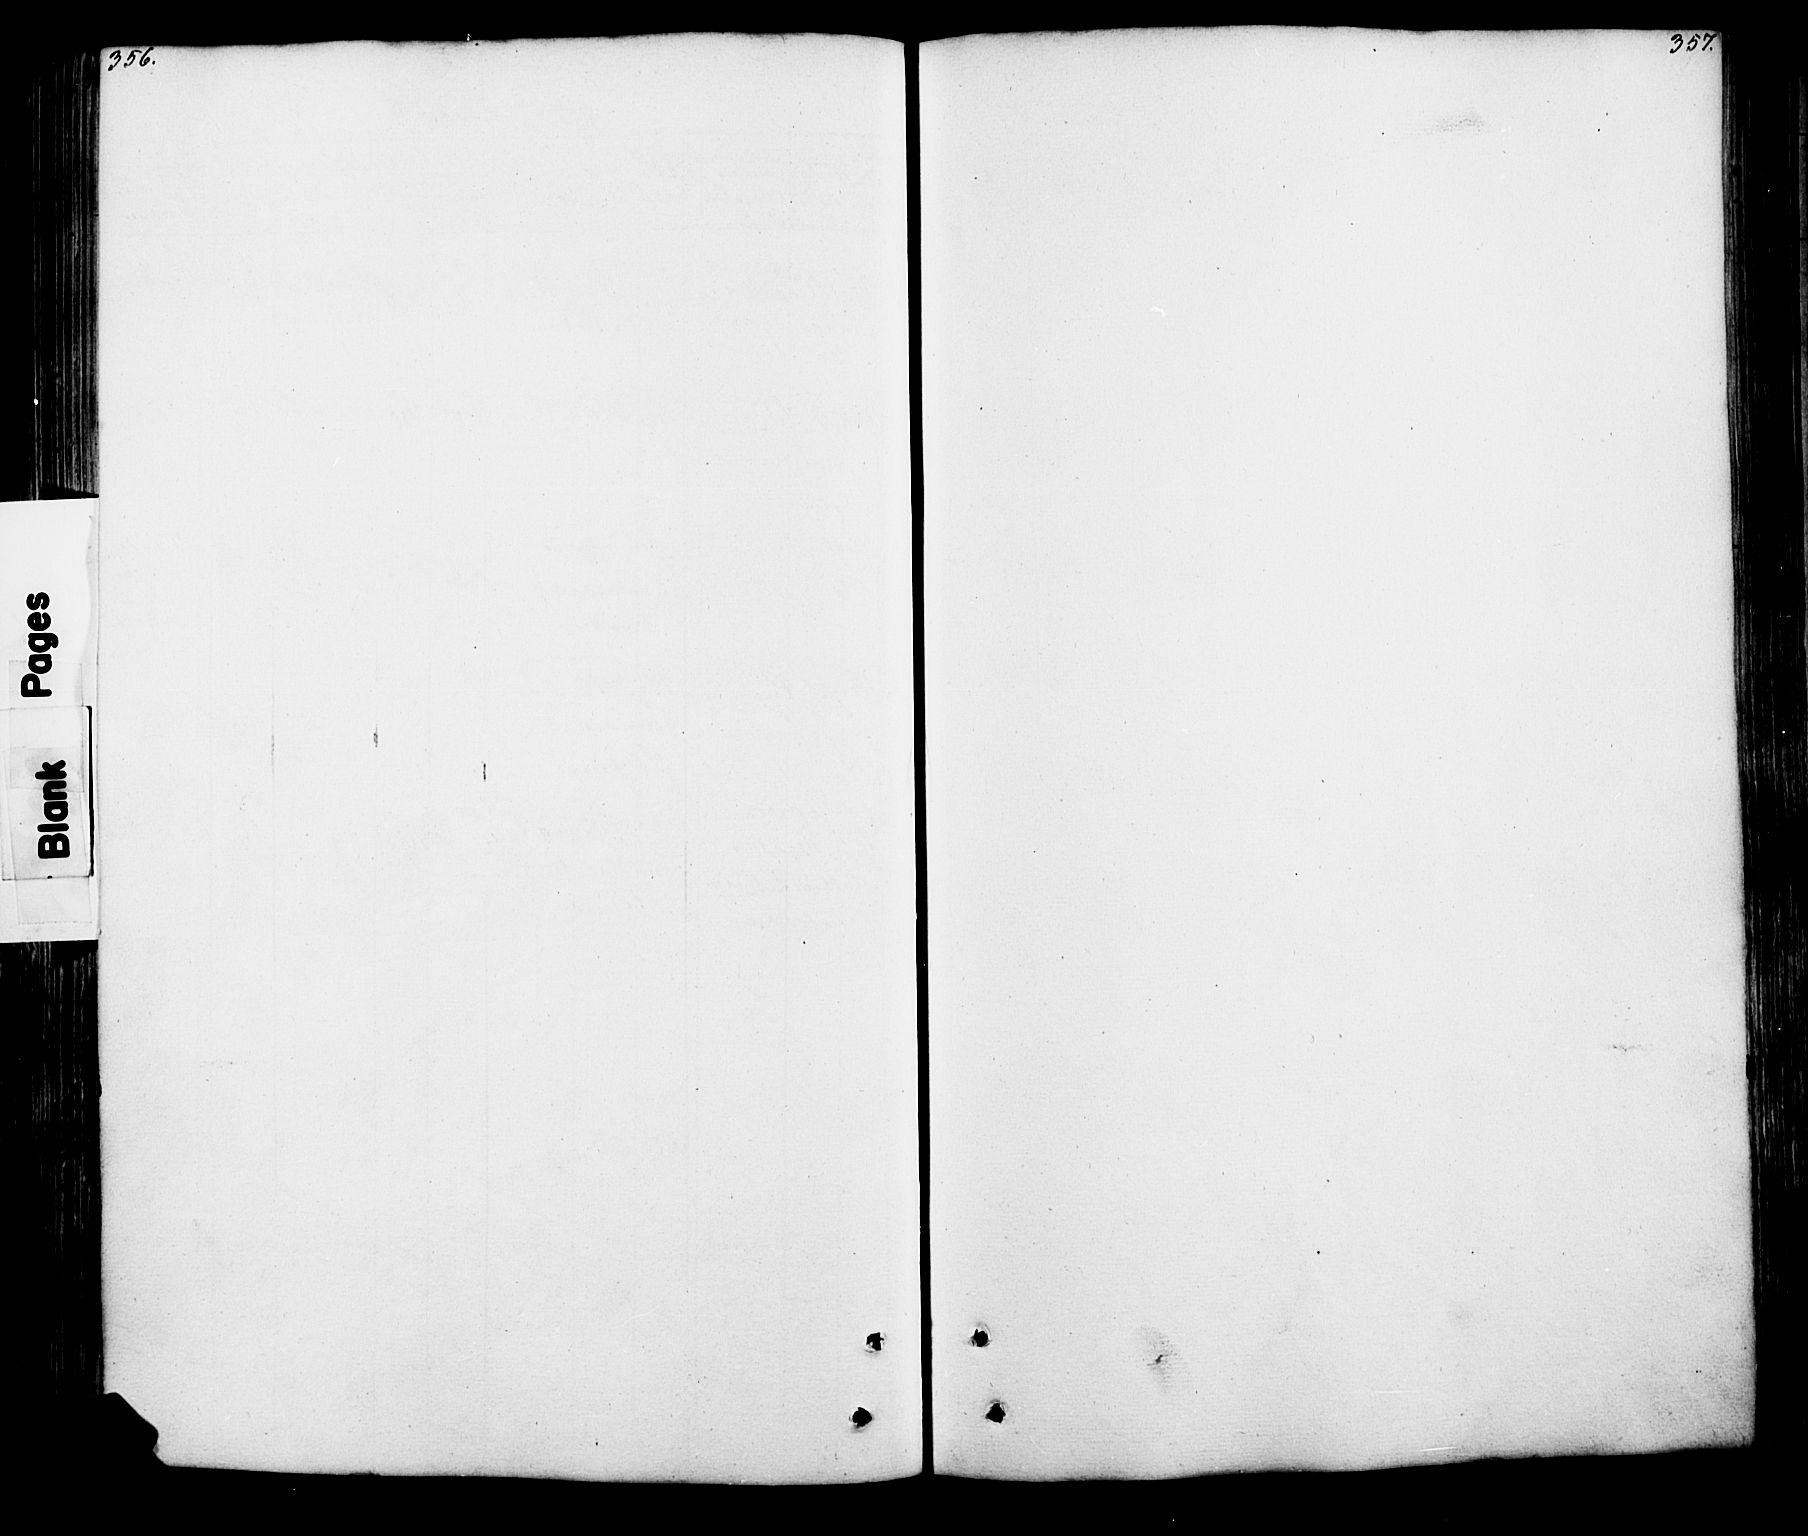 SAH, Lesja prestekontor, Klokkerbok nr. 5, 1850-1894, s. 356-357